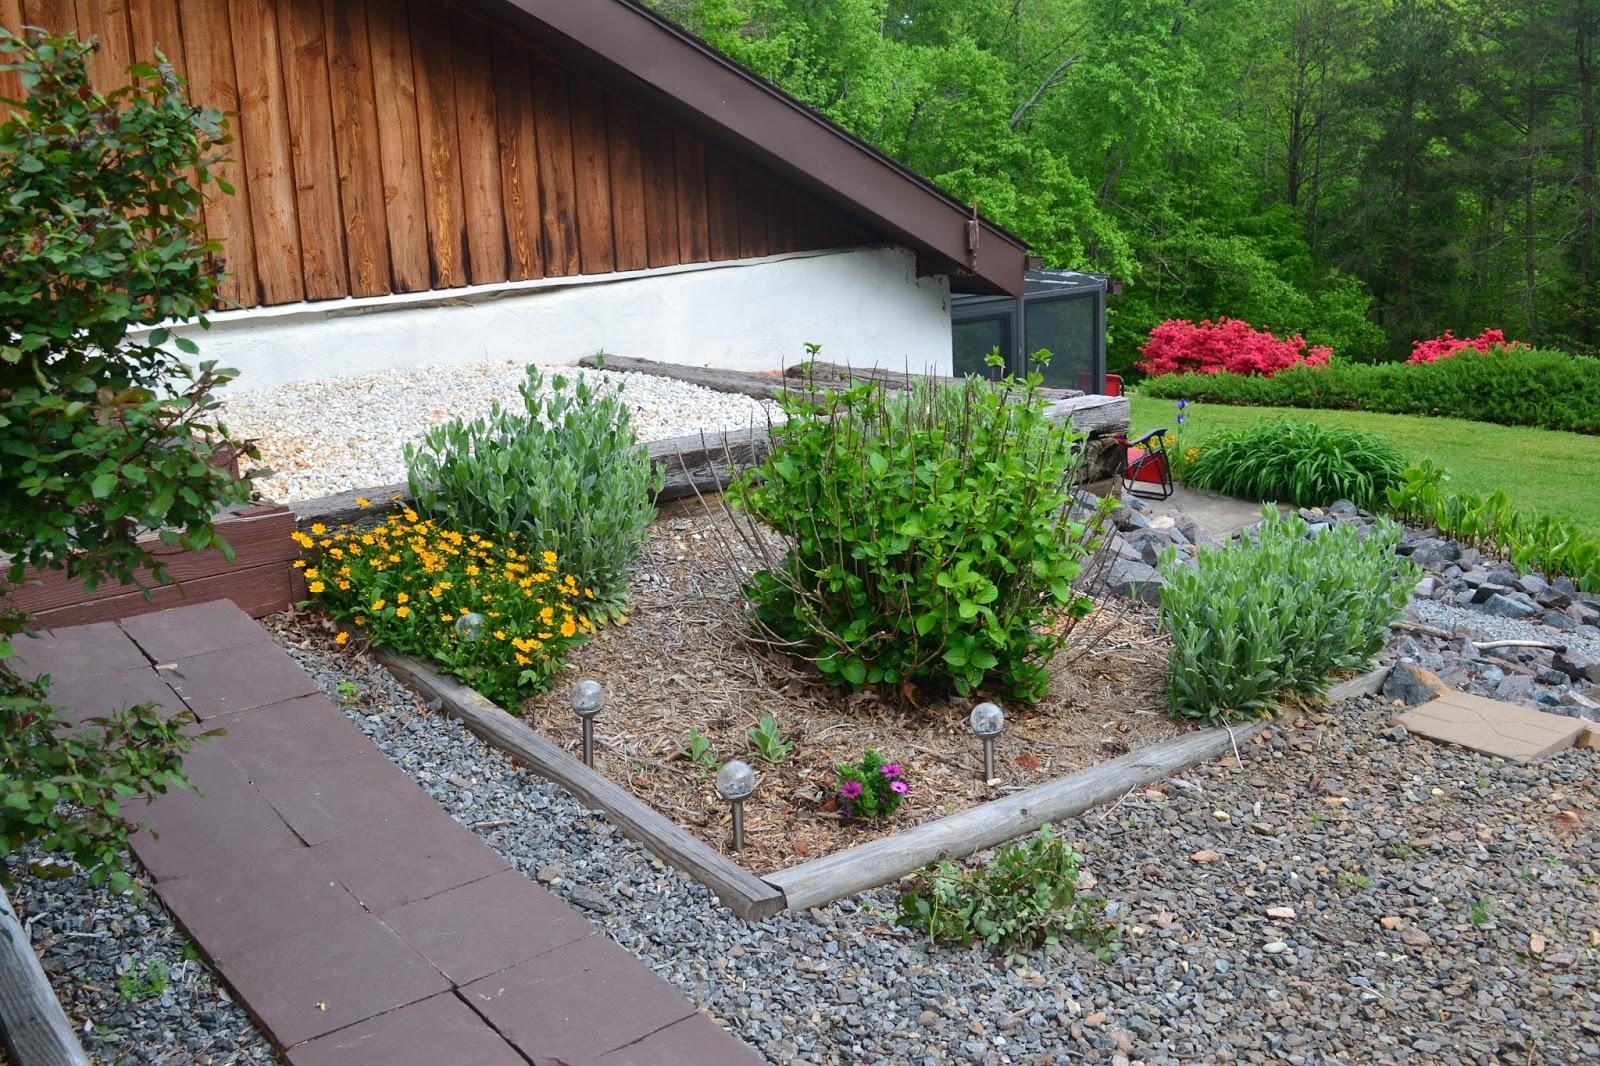 how to take ecare of rosemary bush